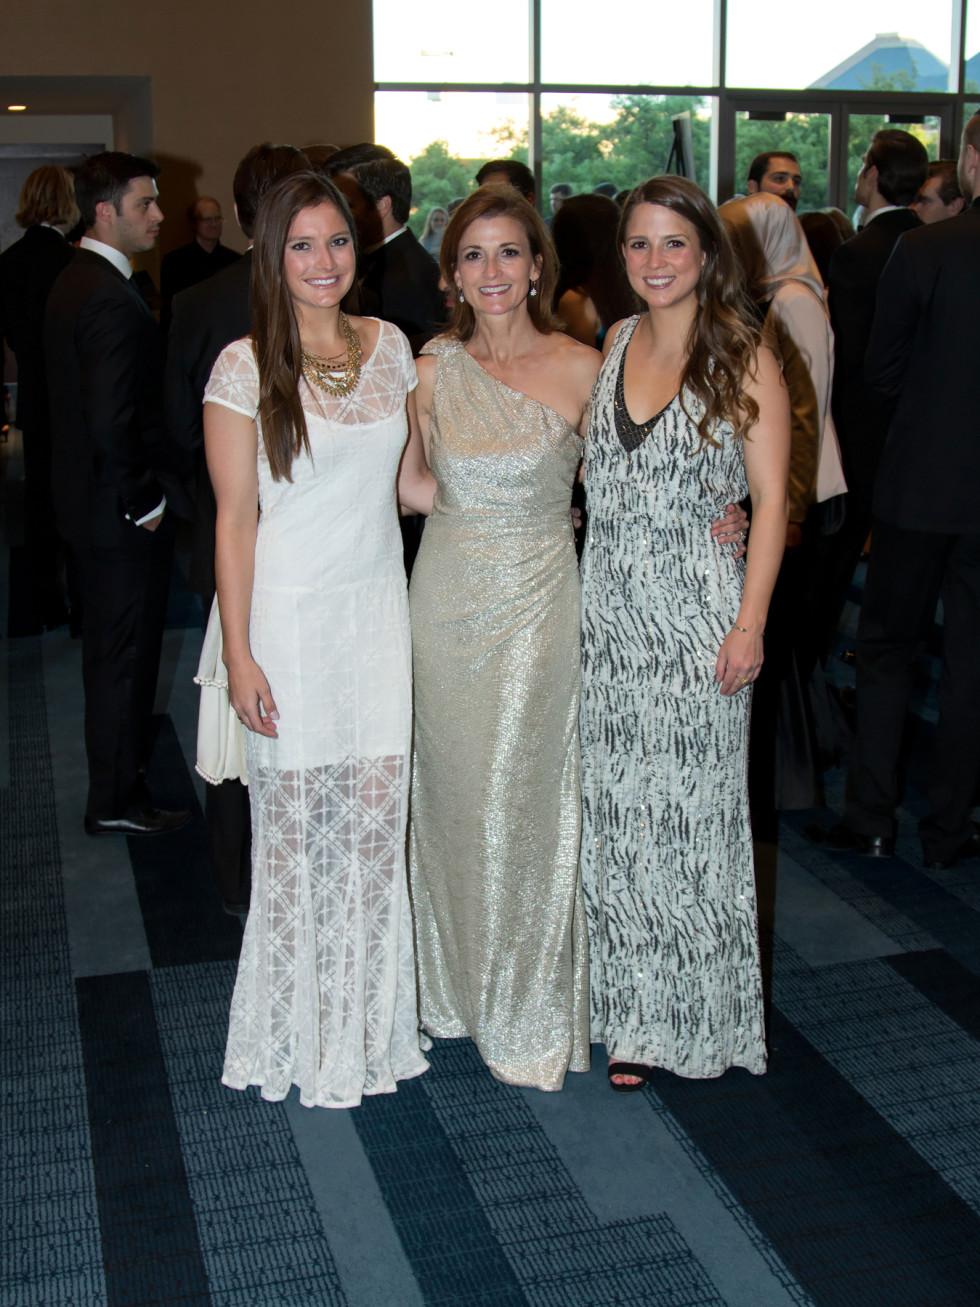 Lindsay Bannon, Cammy Dickenson, Melanie Dickenson